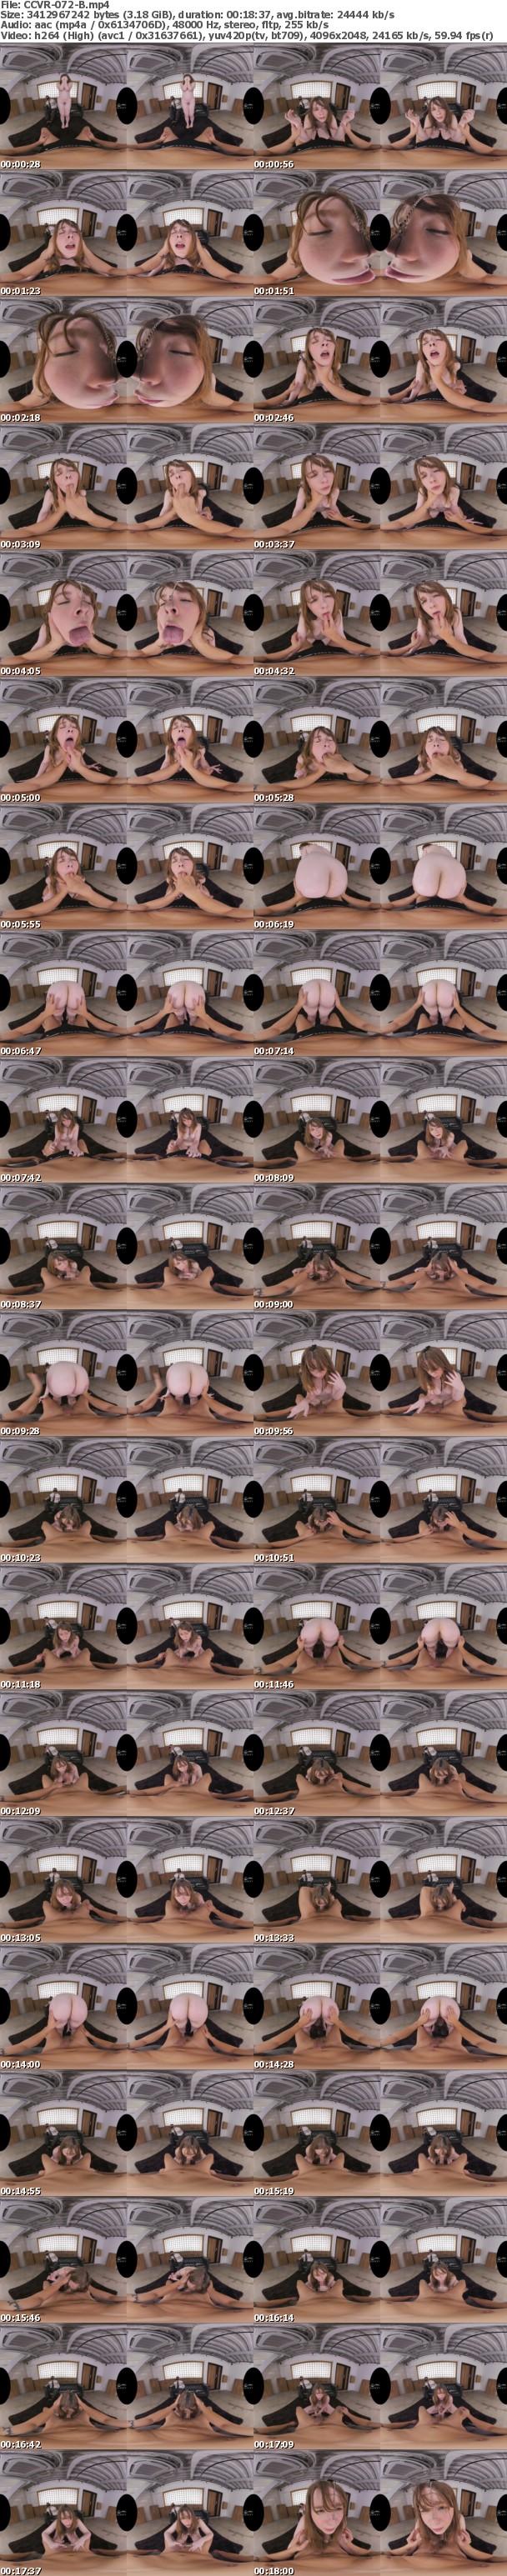 (VR) CCVR-072 【金髪外人夫婦NTR】旦那の目の前で犯●れて…。『お願いします、これで最後にして下さい。』ジューン・ラブジョイ